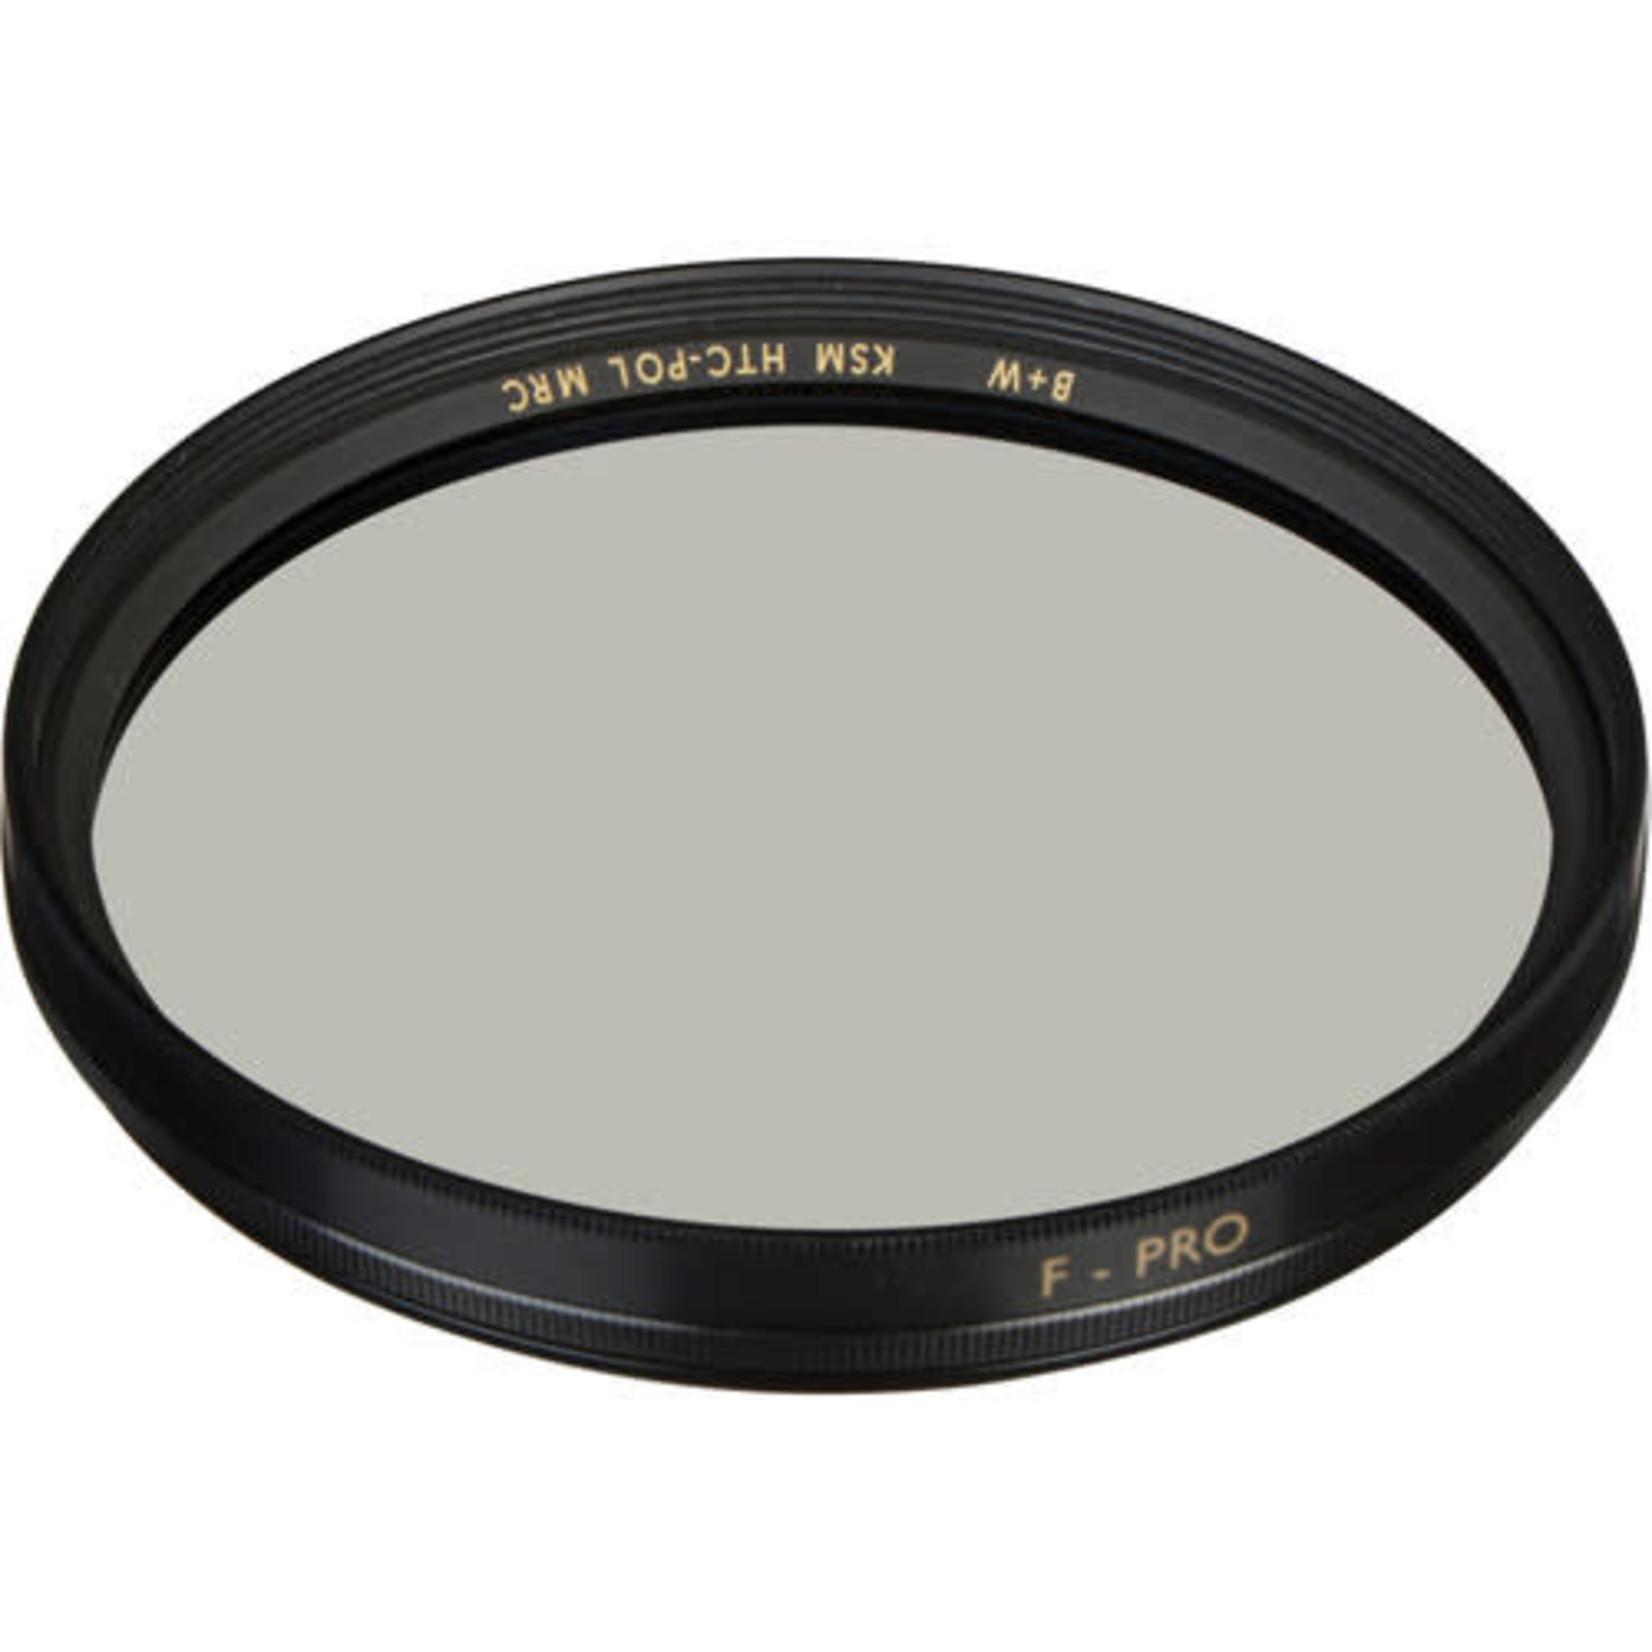 B+W B+W 95mm F-Pro Kaesemann High Transmission Circular Polarizer MRC Filter